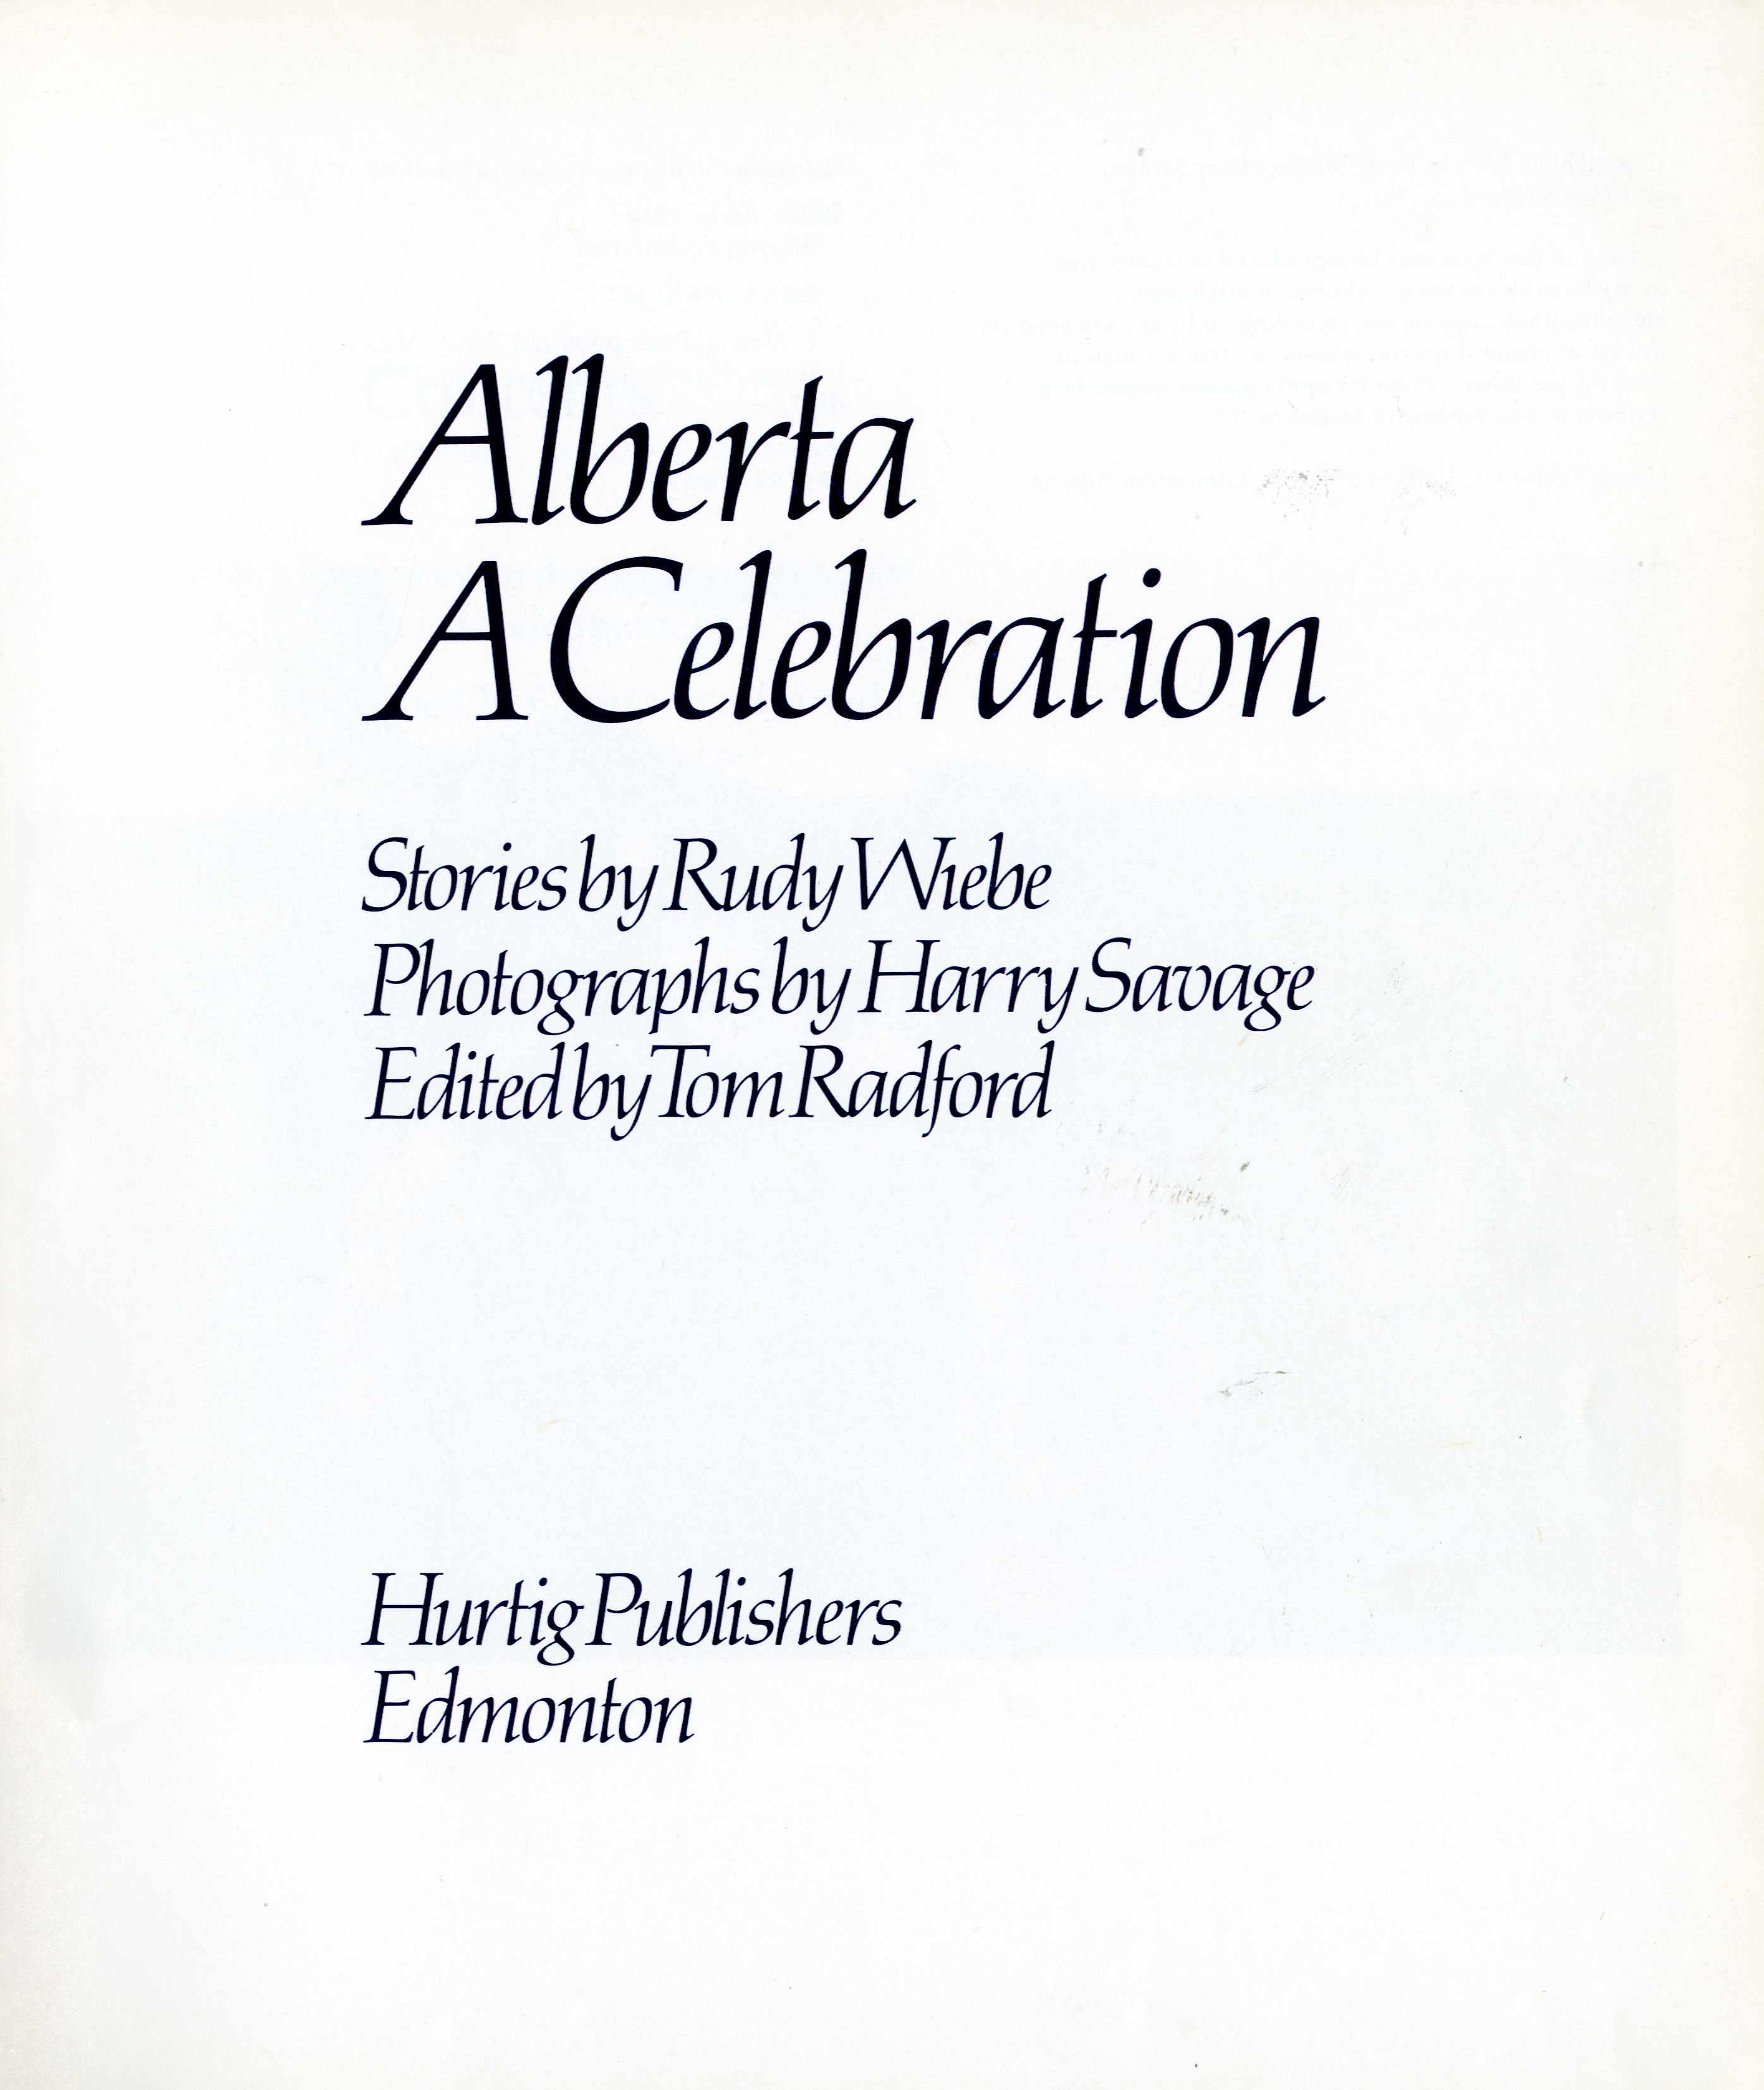 Alberta: A Celebration Image